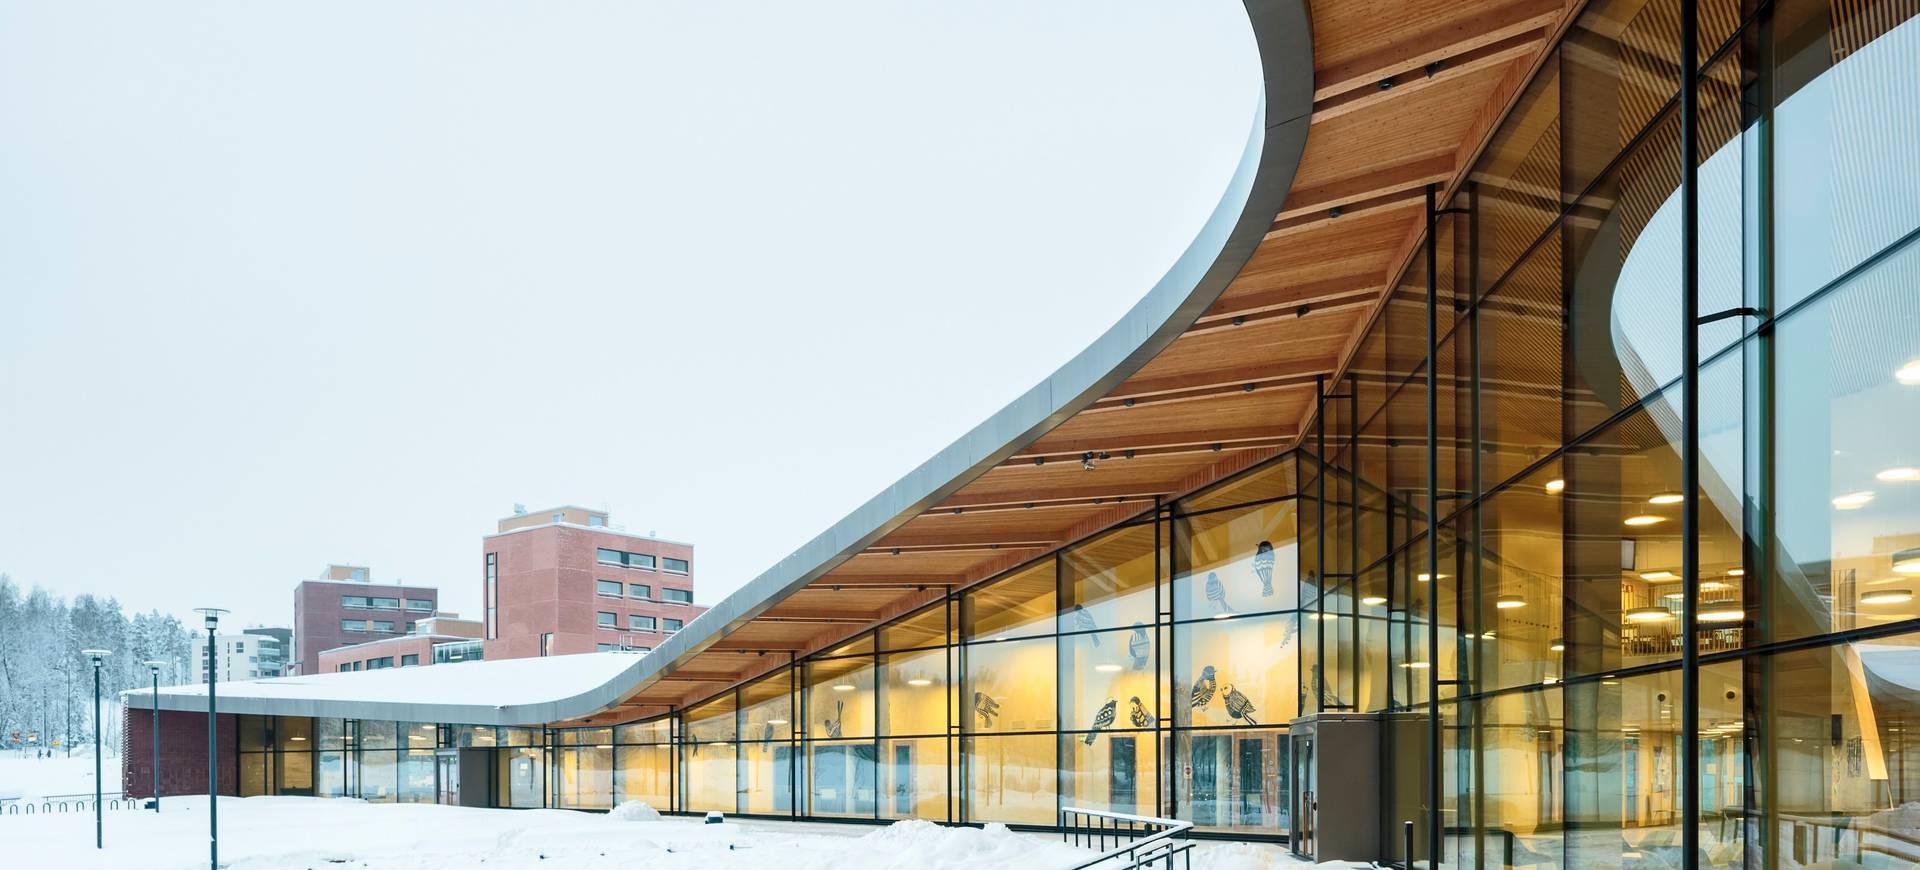 Школа Saunalahti (Фото: Туомас Уусхаймо)